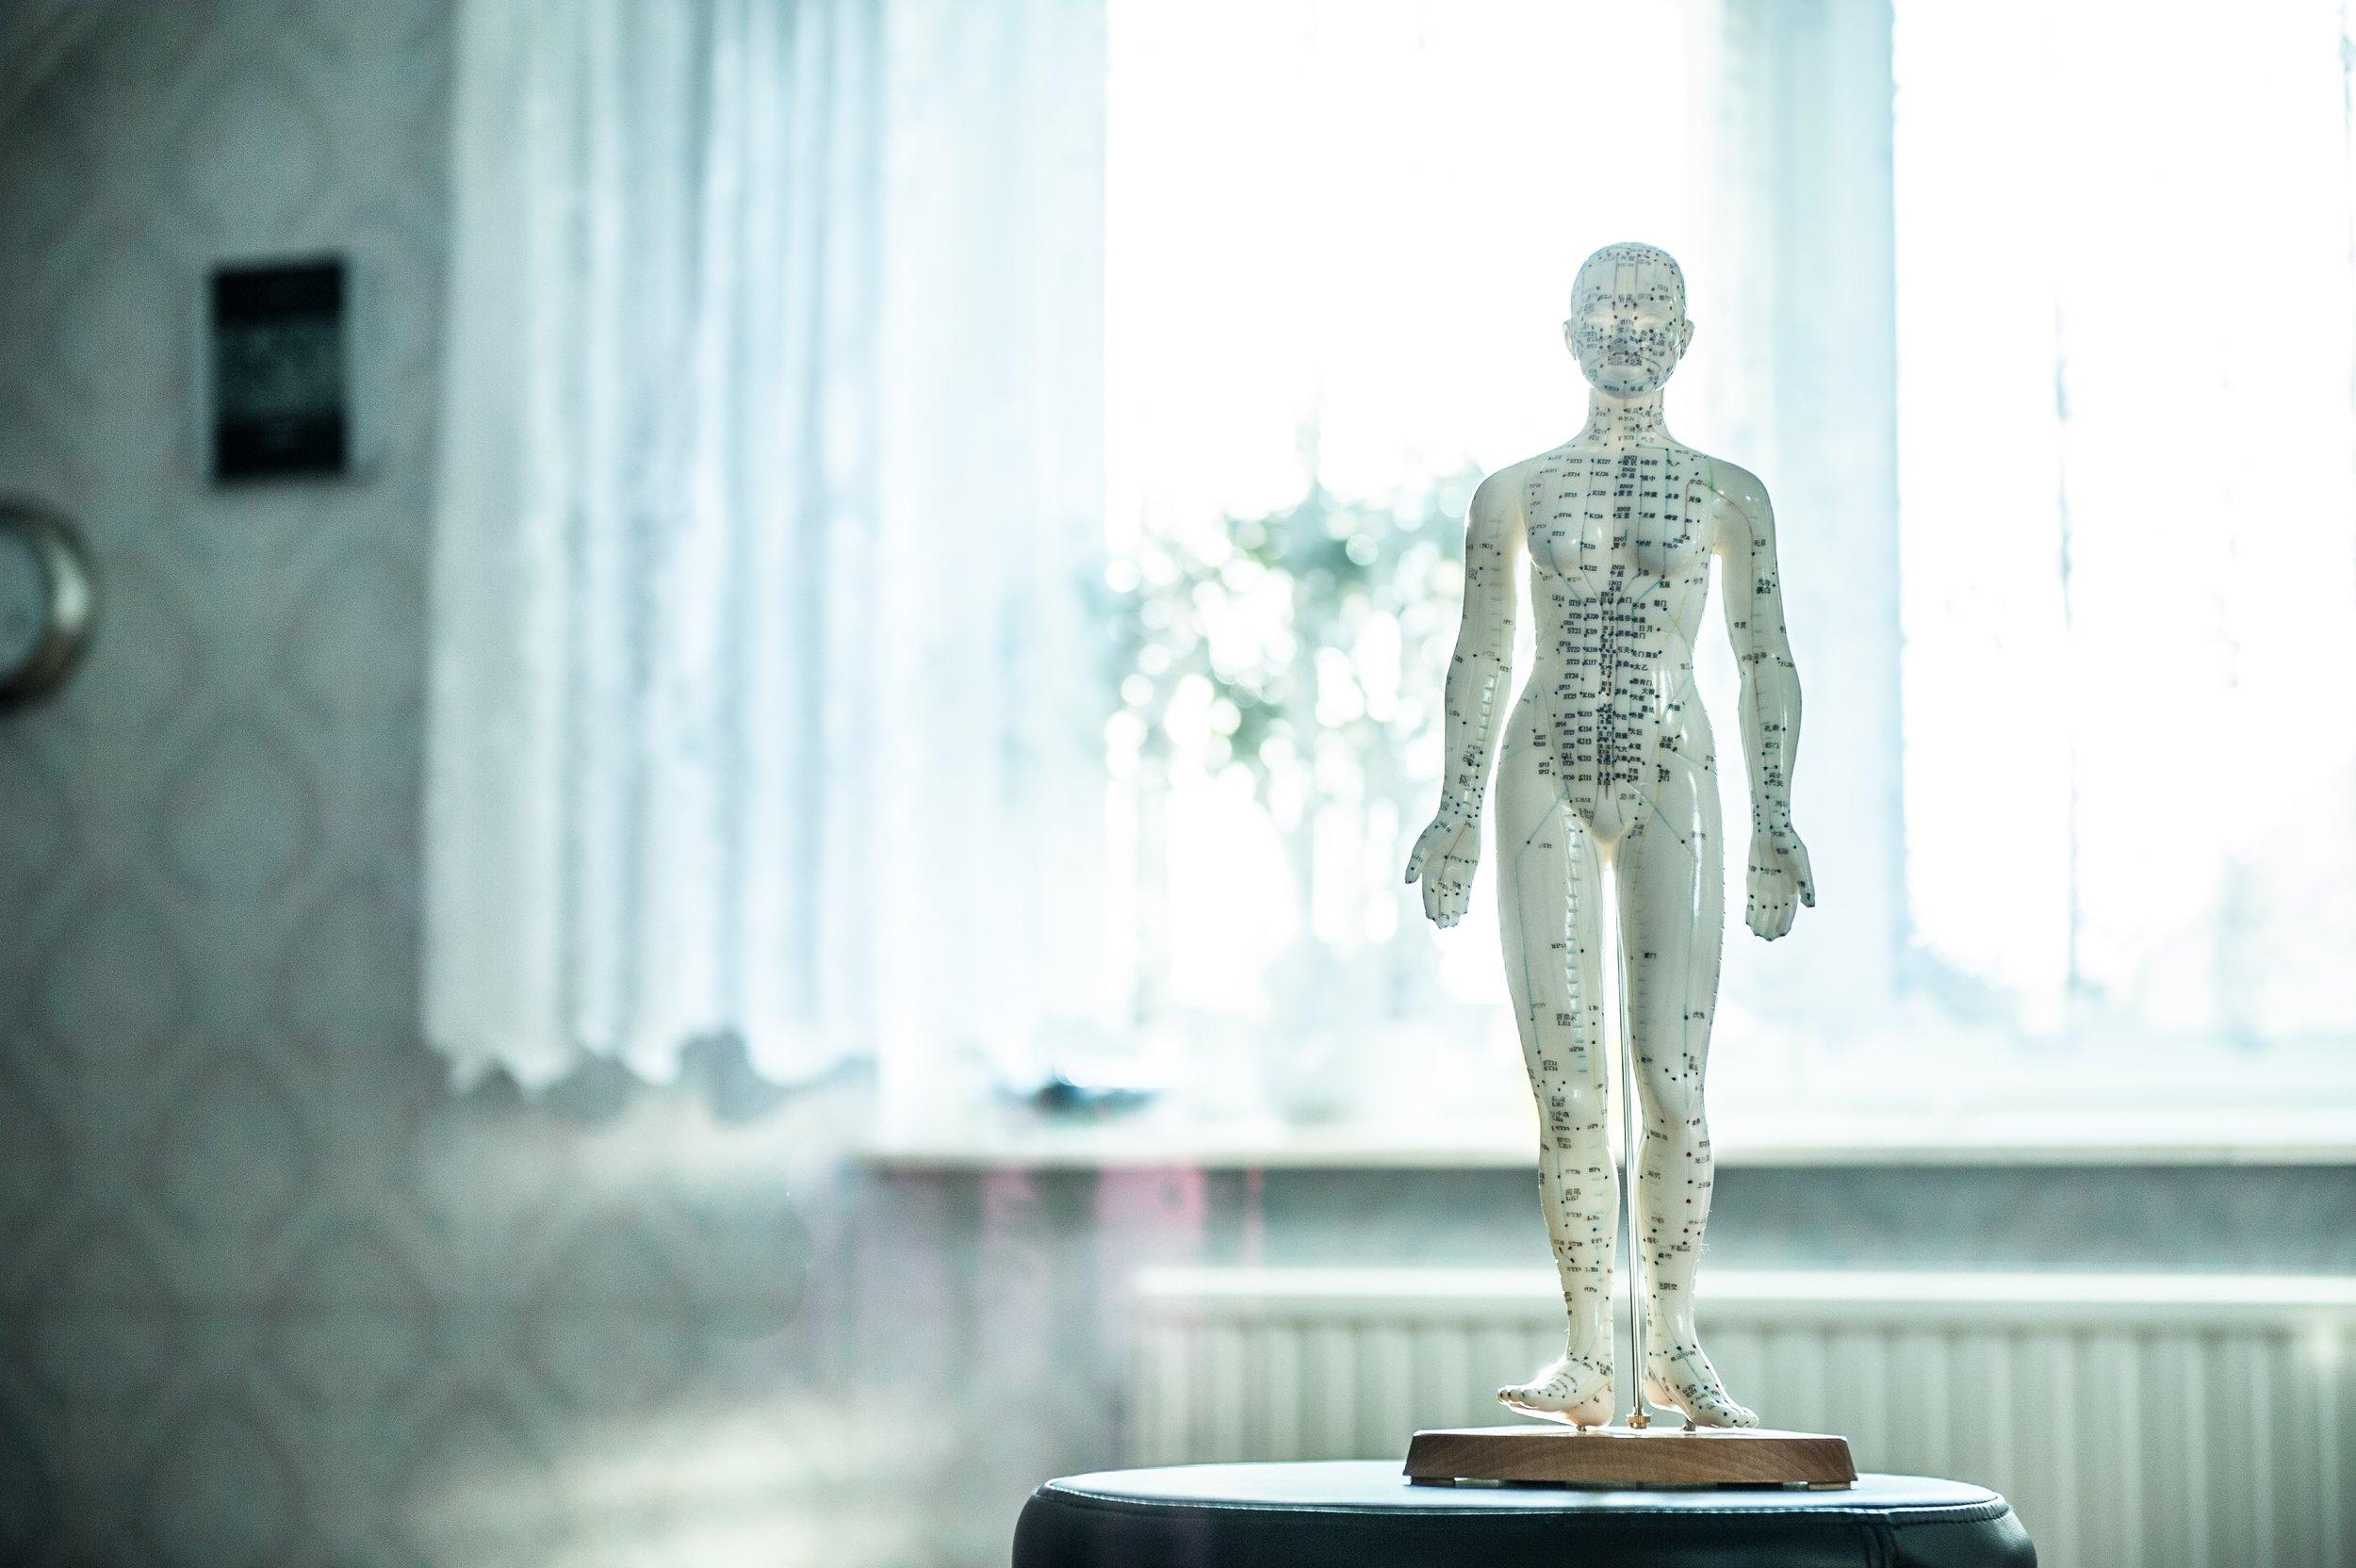 monument-statue-relax-fashion-sculpture-art-822241-pxhere.com.jpg